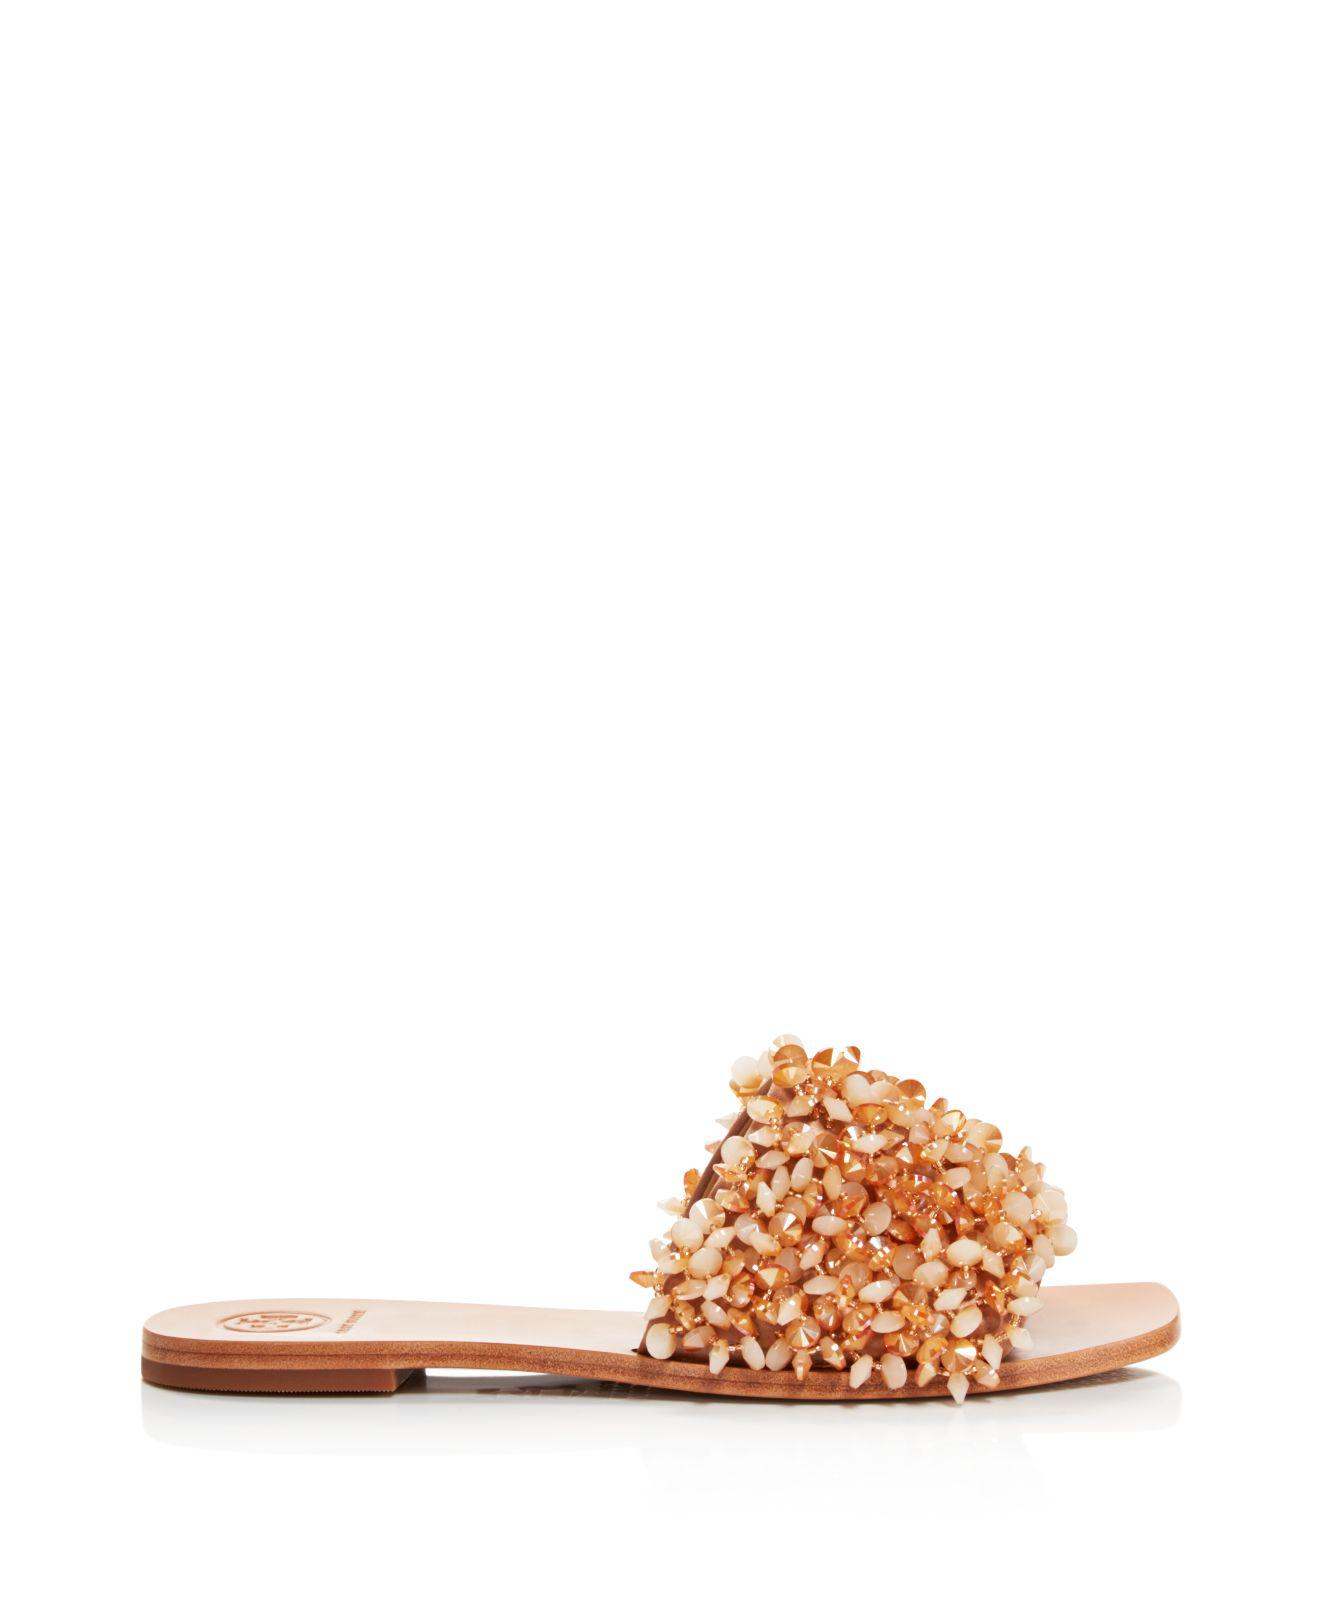 a5d962742349 Lyst - Tory Burch Women s Logan Embellished Slide Sandals